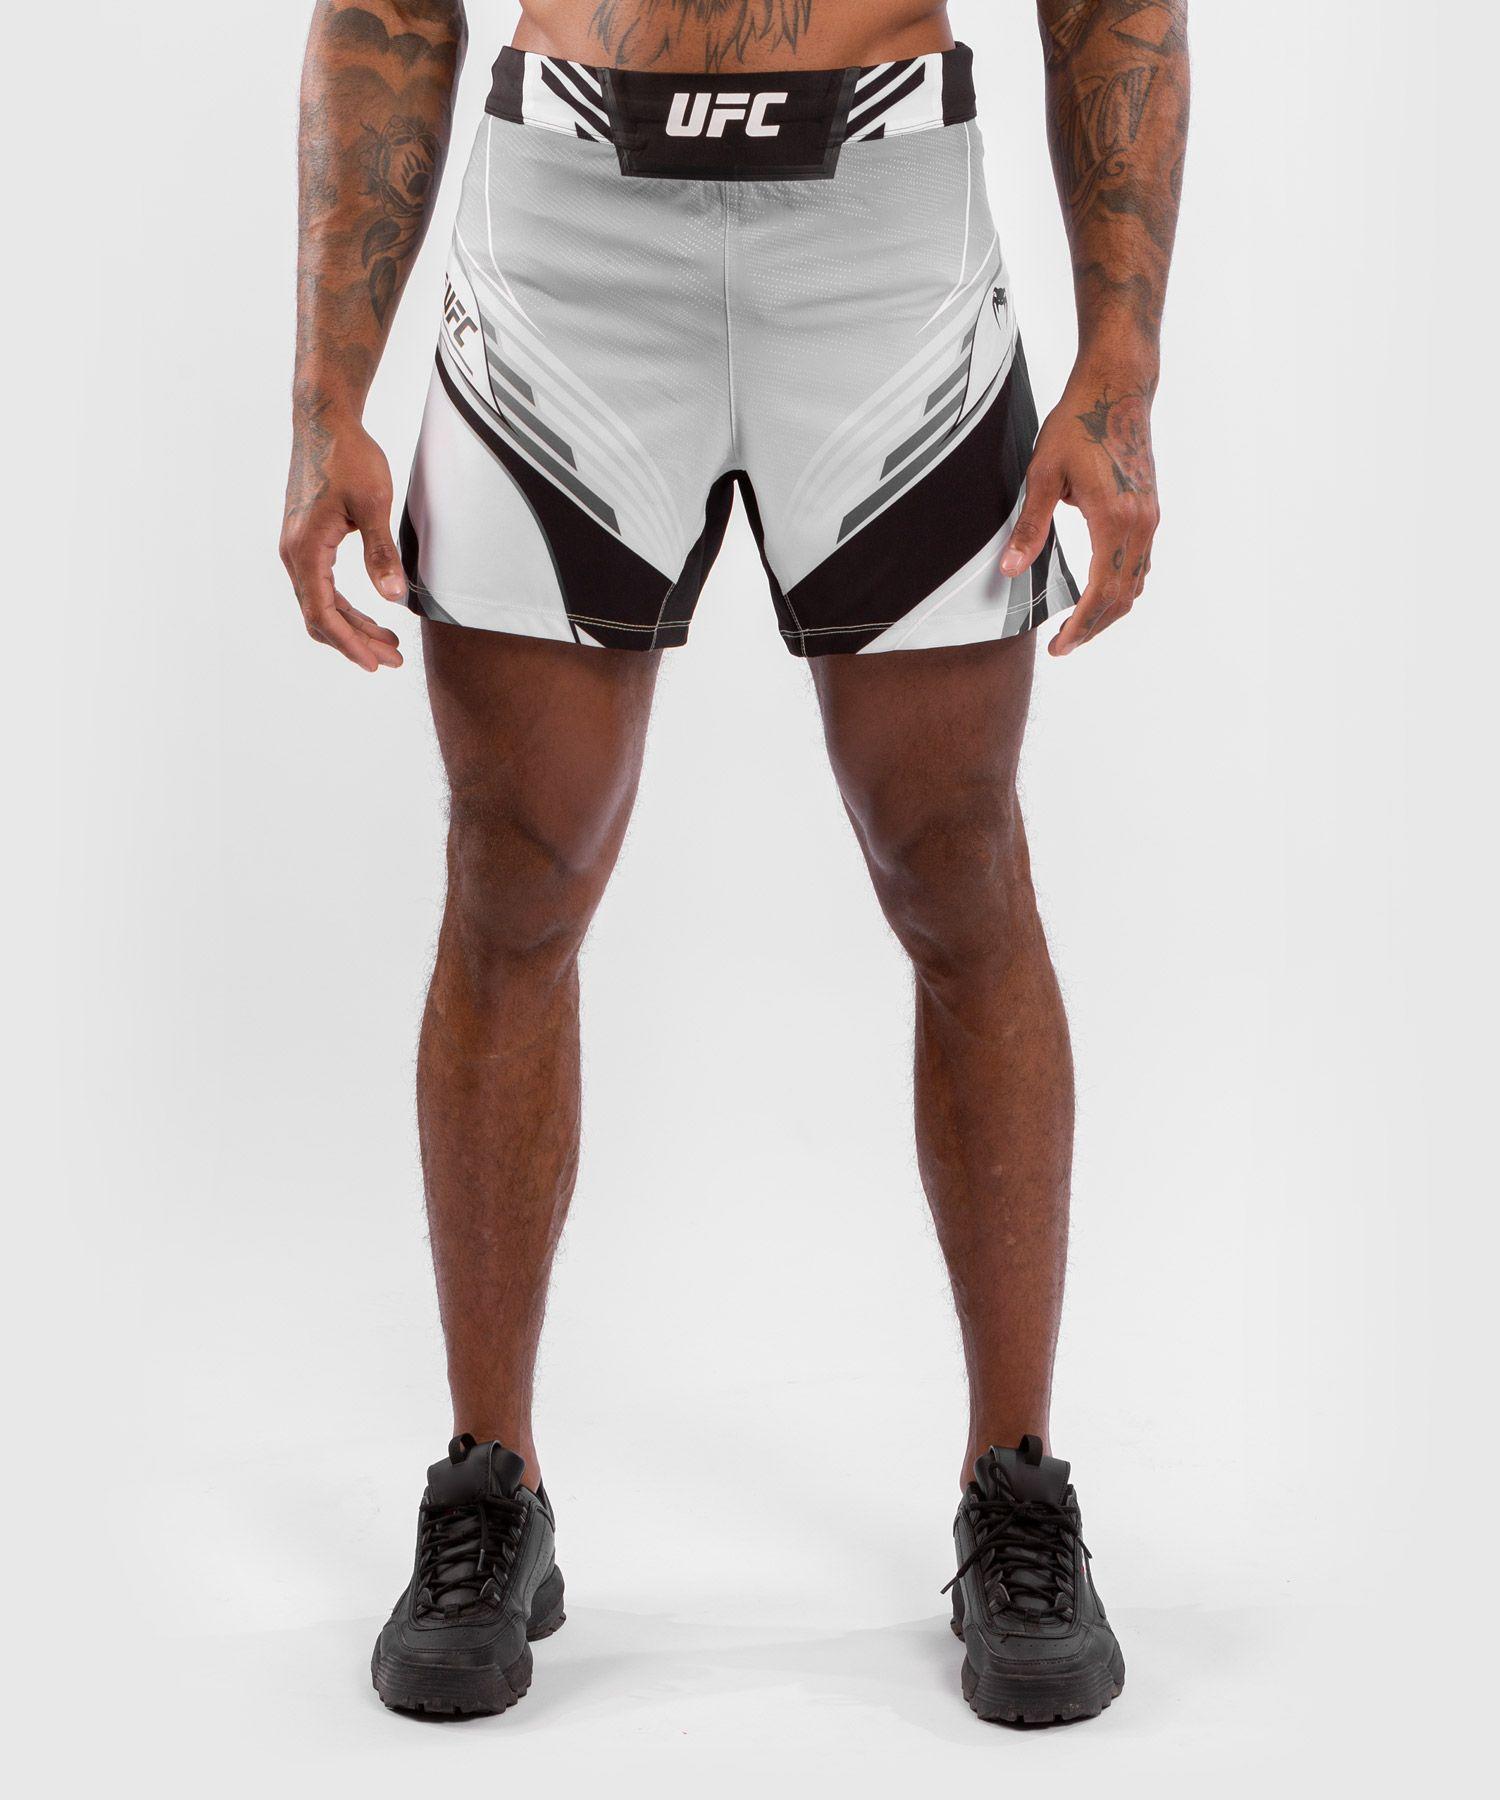 UFC Venum Authentic Fight Night Men's Shorts - Short Fit - White